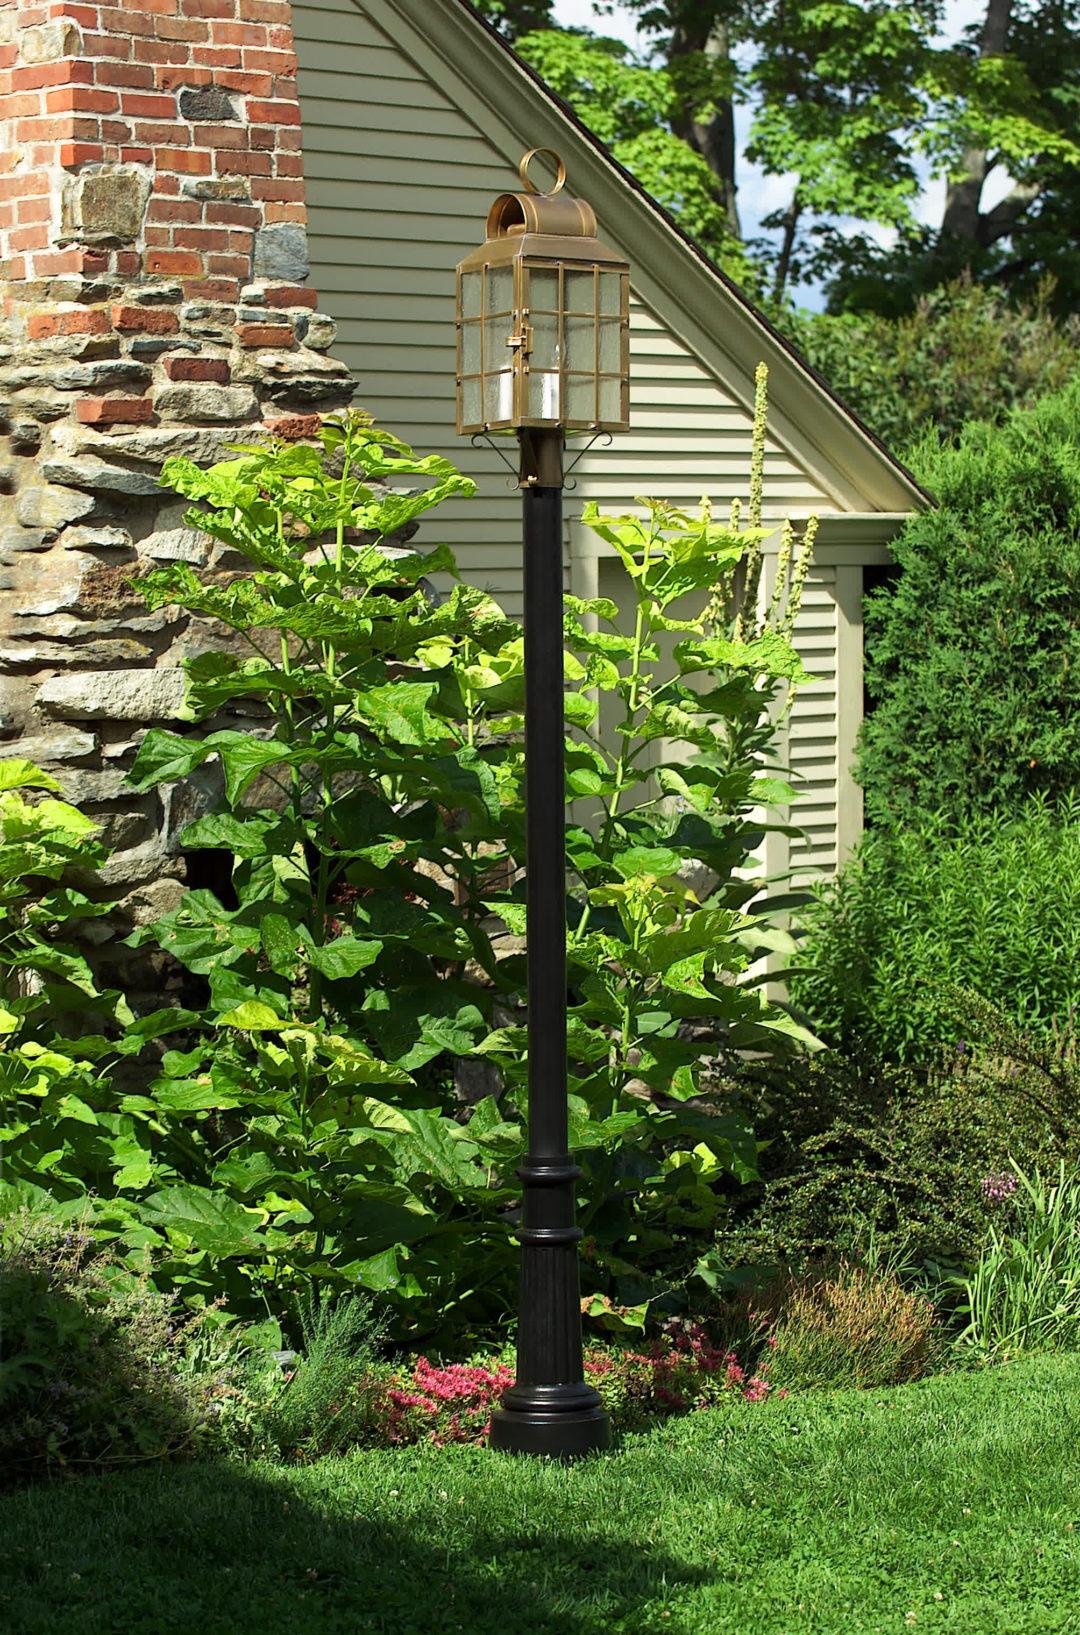 Hammerworks Aluminum Lantern Pole: The Yarmouth